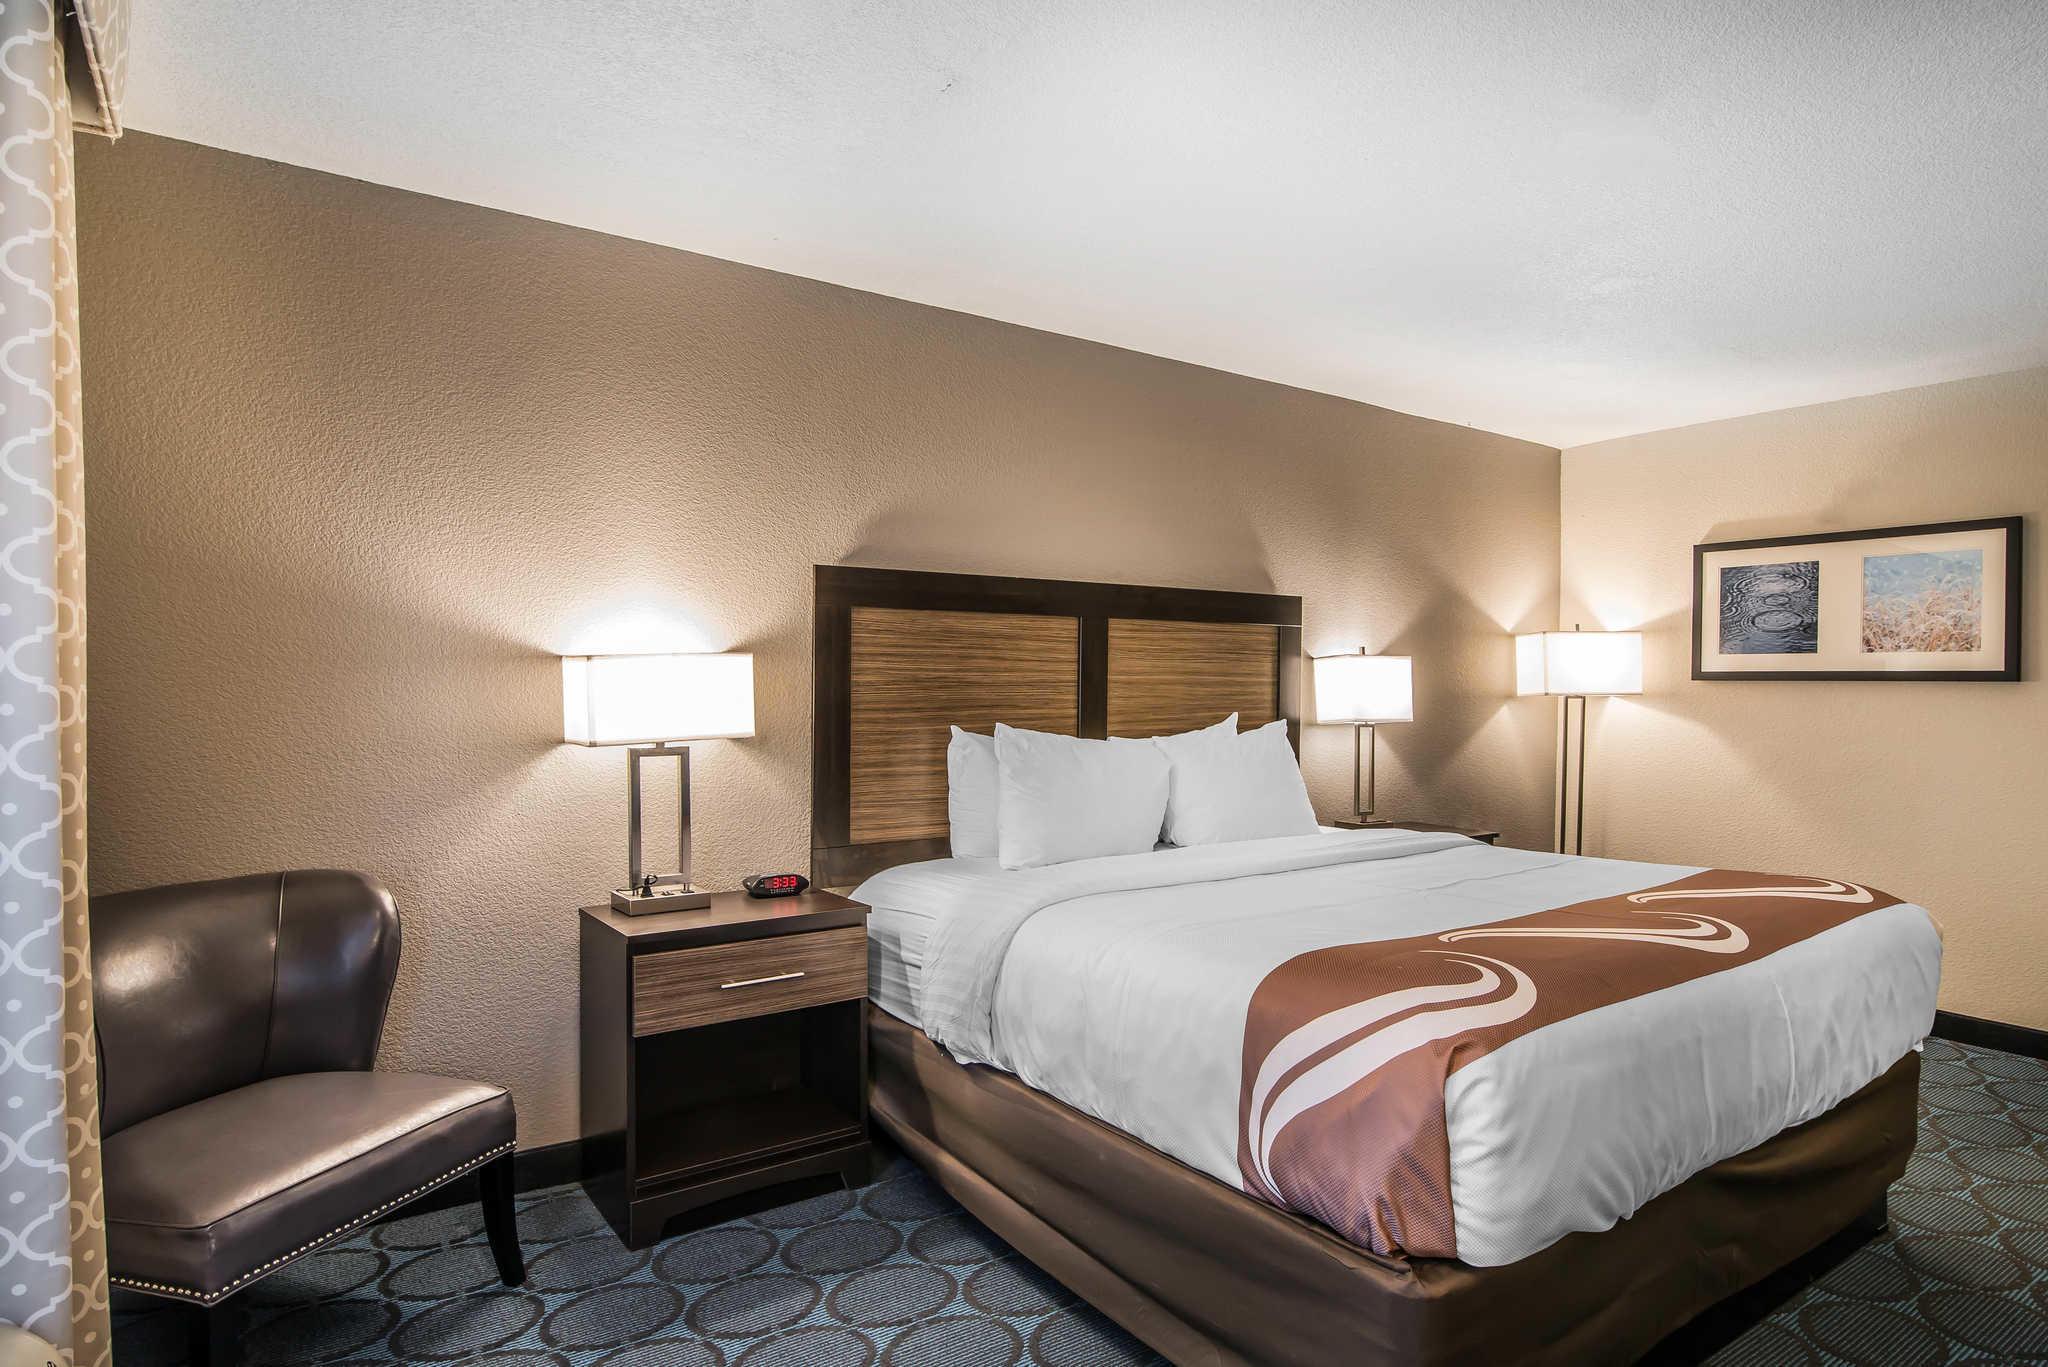 Quality Inn & Suites - Ruidoso Hwy 70 image 7